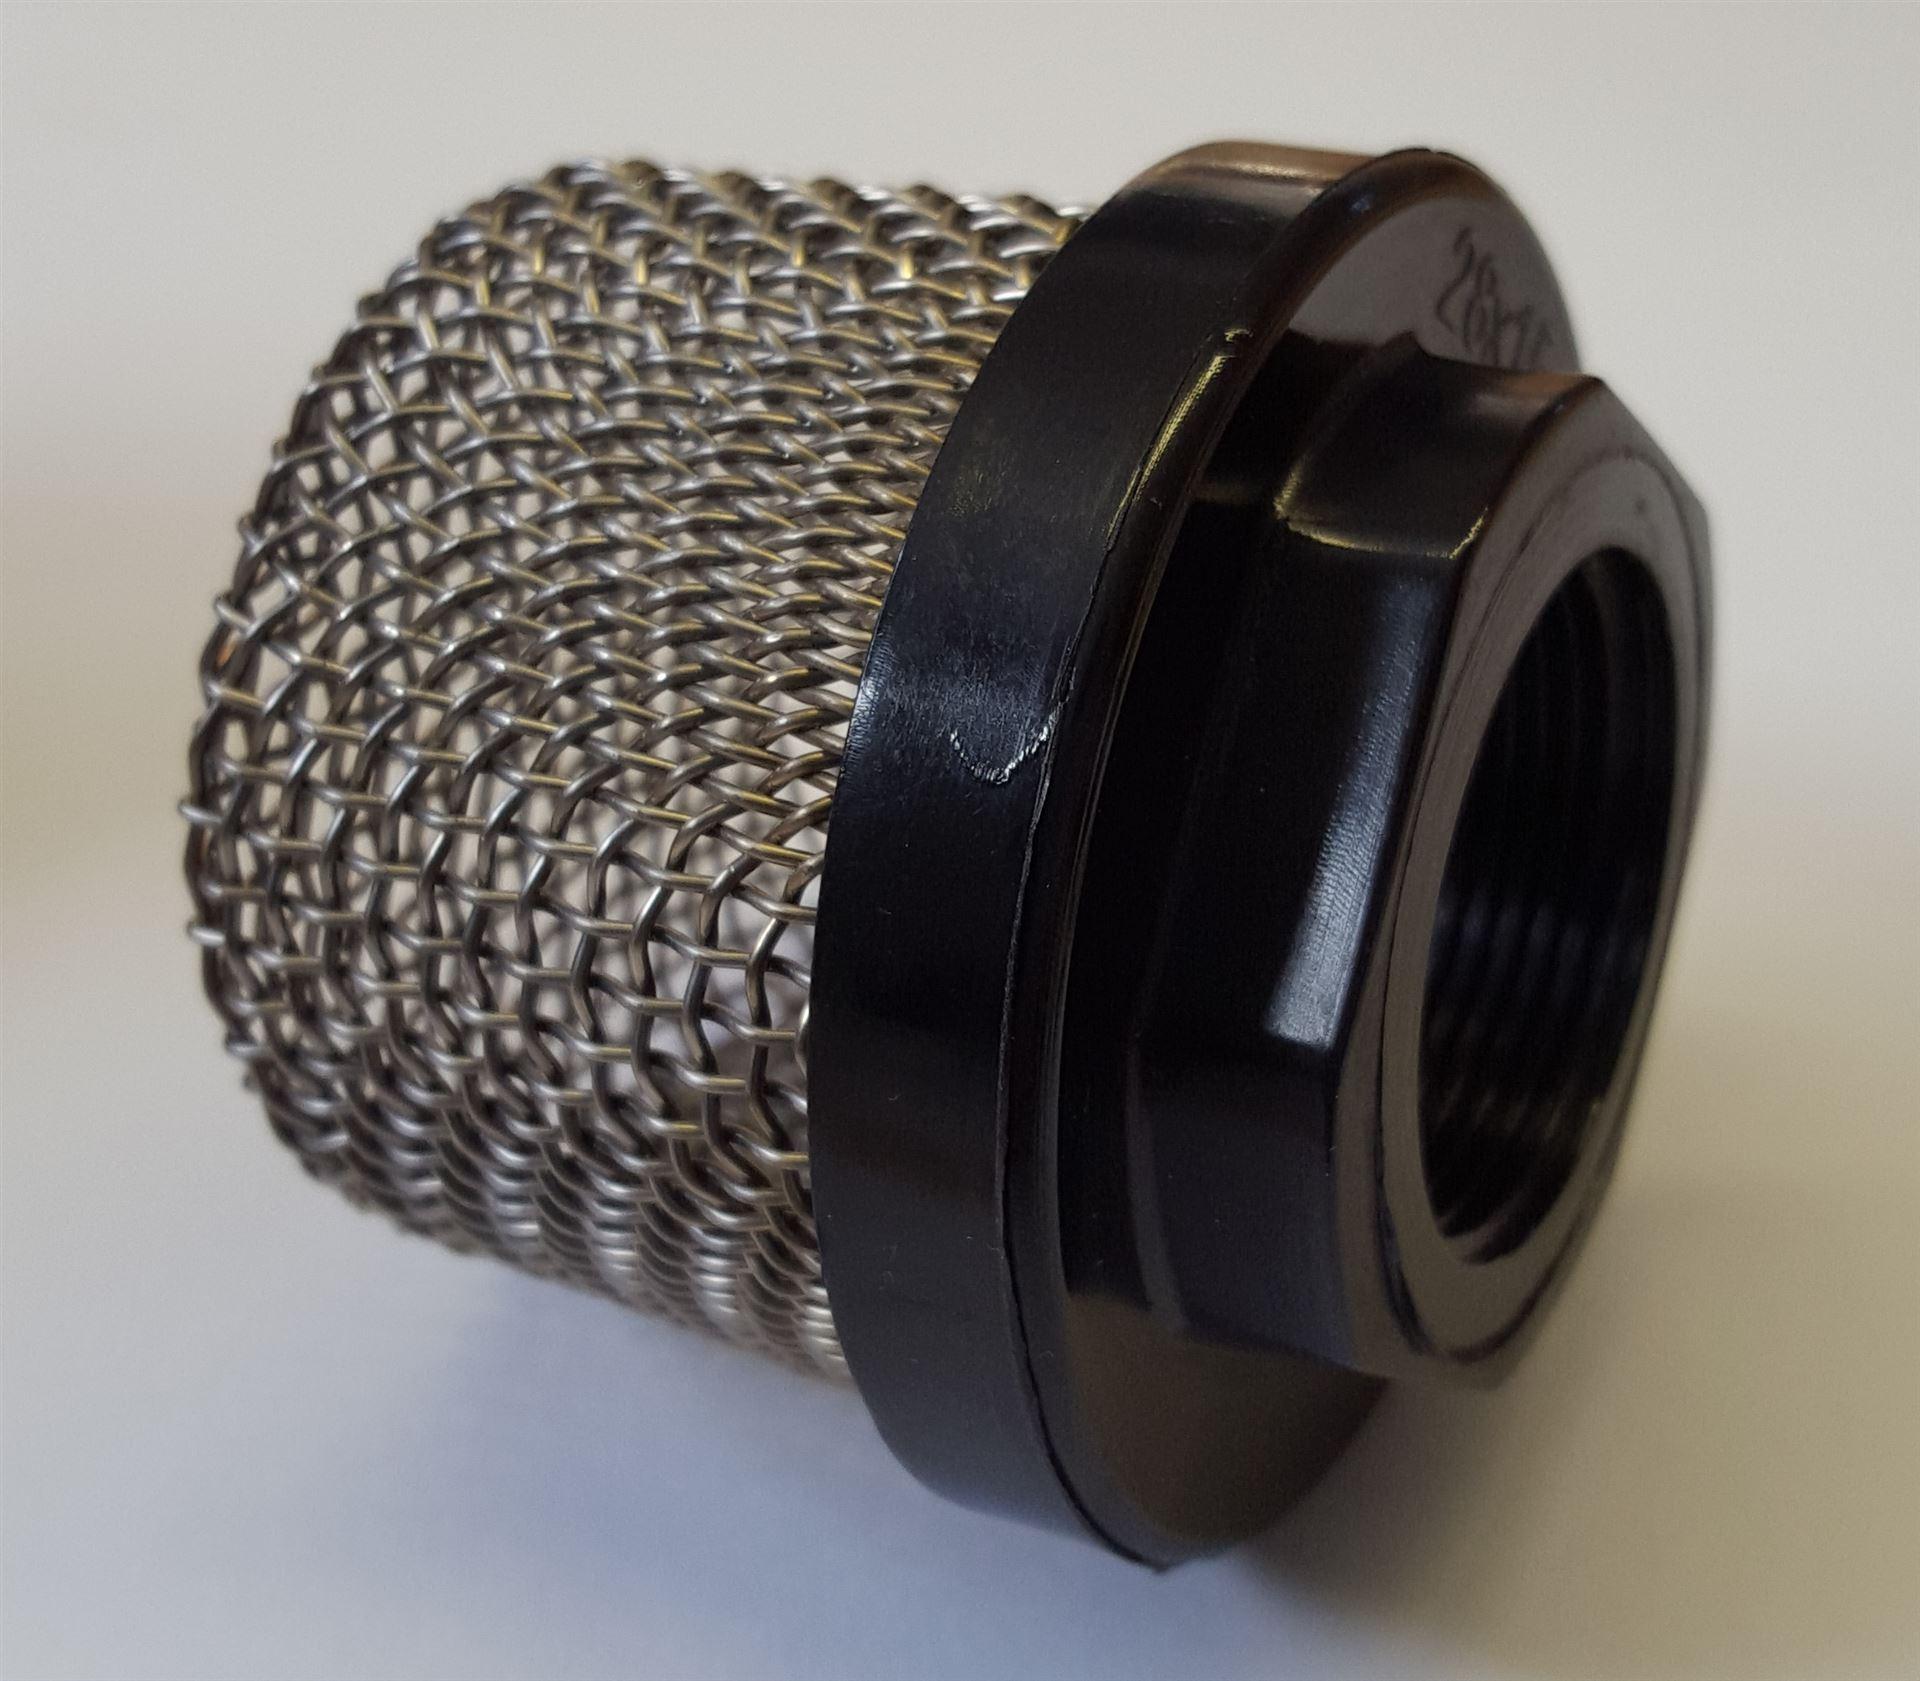 22 mm2/_Dieselausführung/_Traktor/_Schlepper/_ Massekabel/_Masseband 300mm